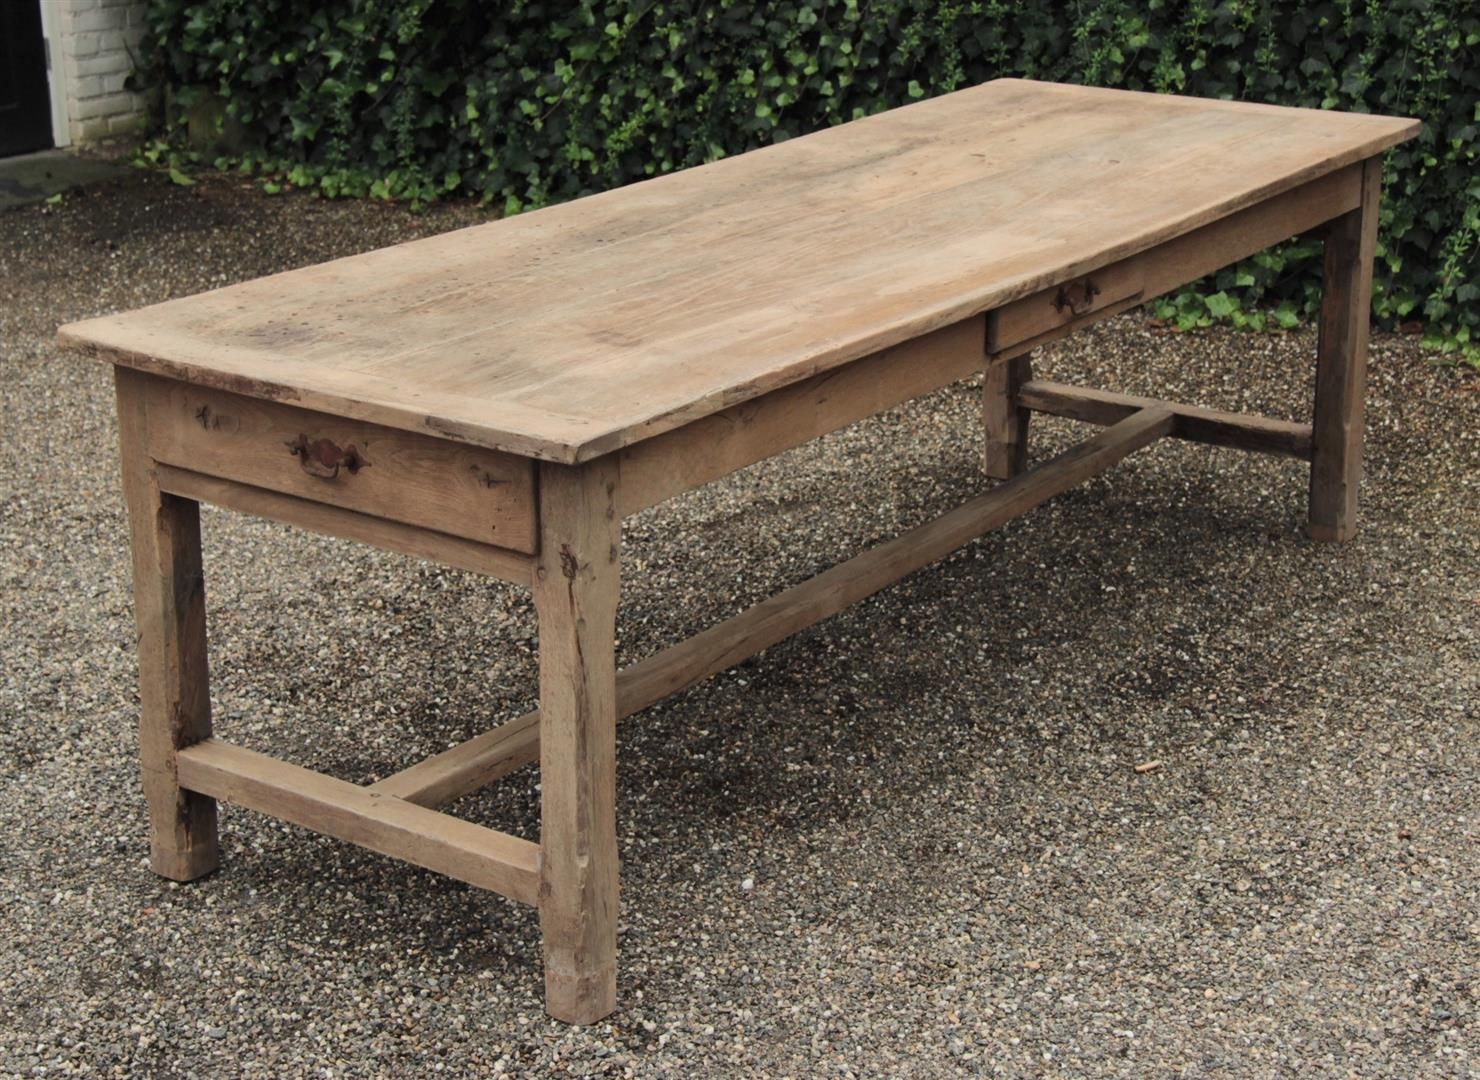 Antieke franse tafel eiken frankrijk 1830 19e eeuw table pinterest franse - Grote ronde houten tafel ...